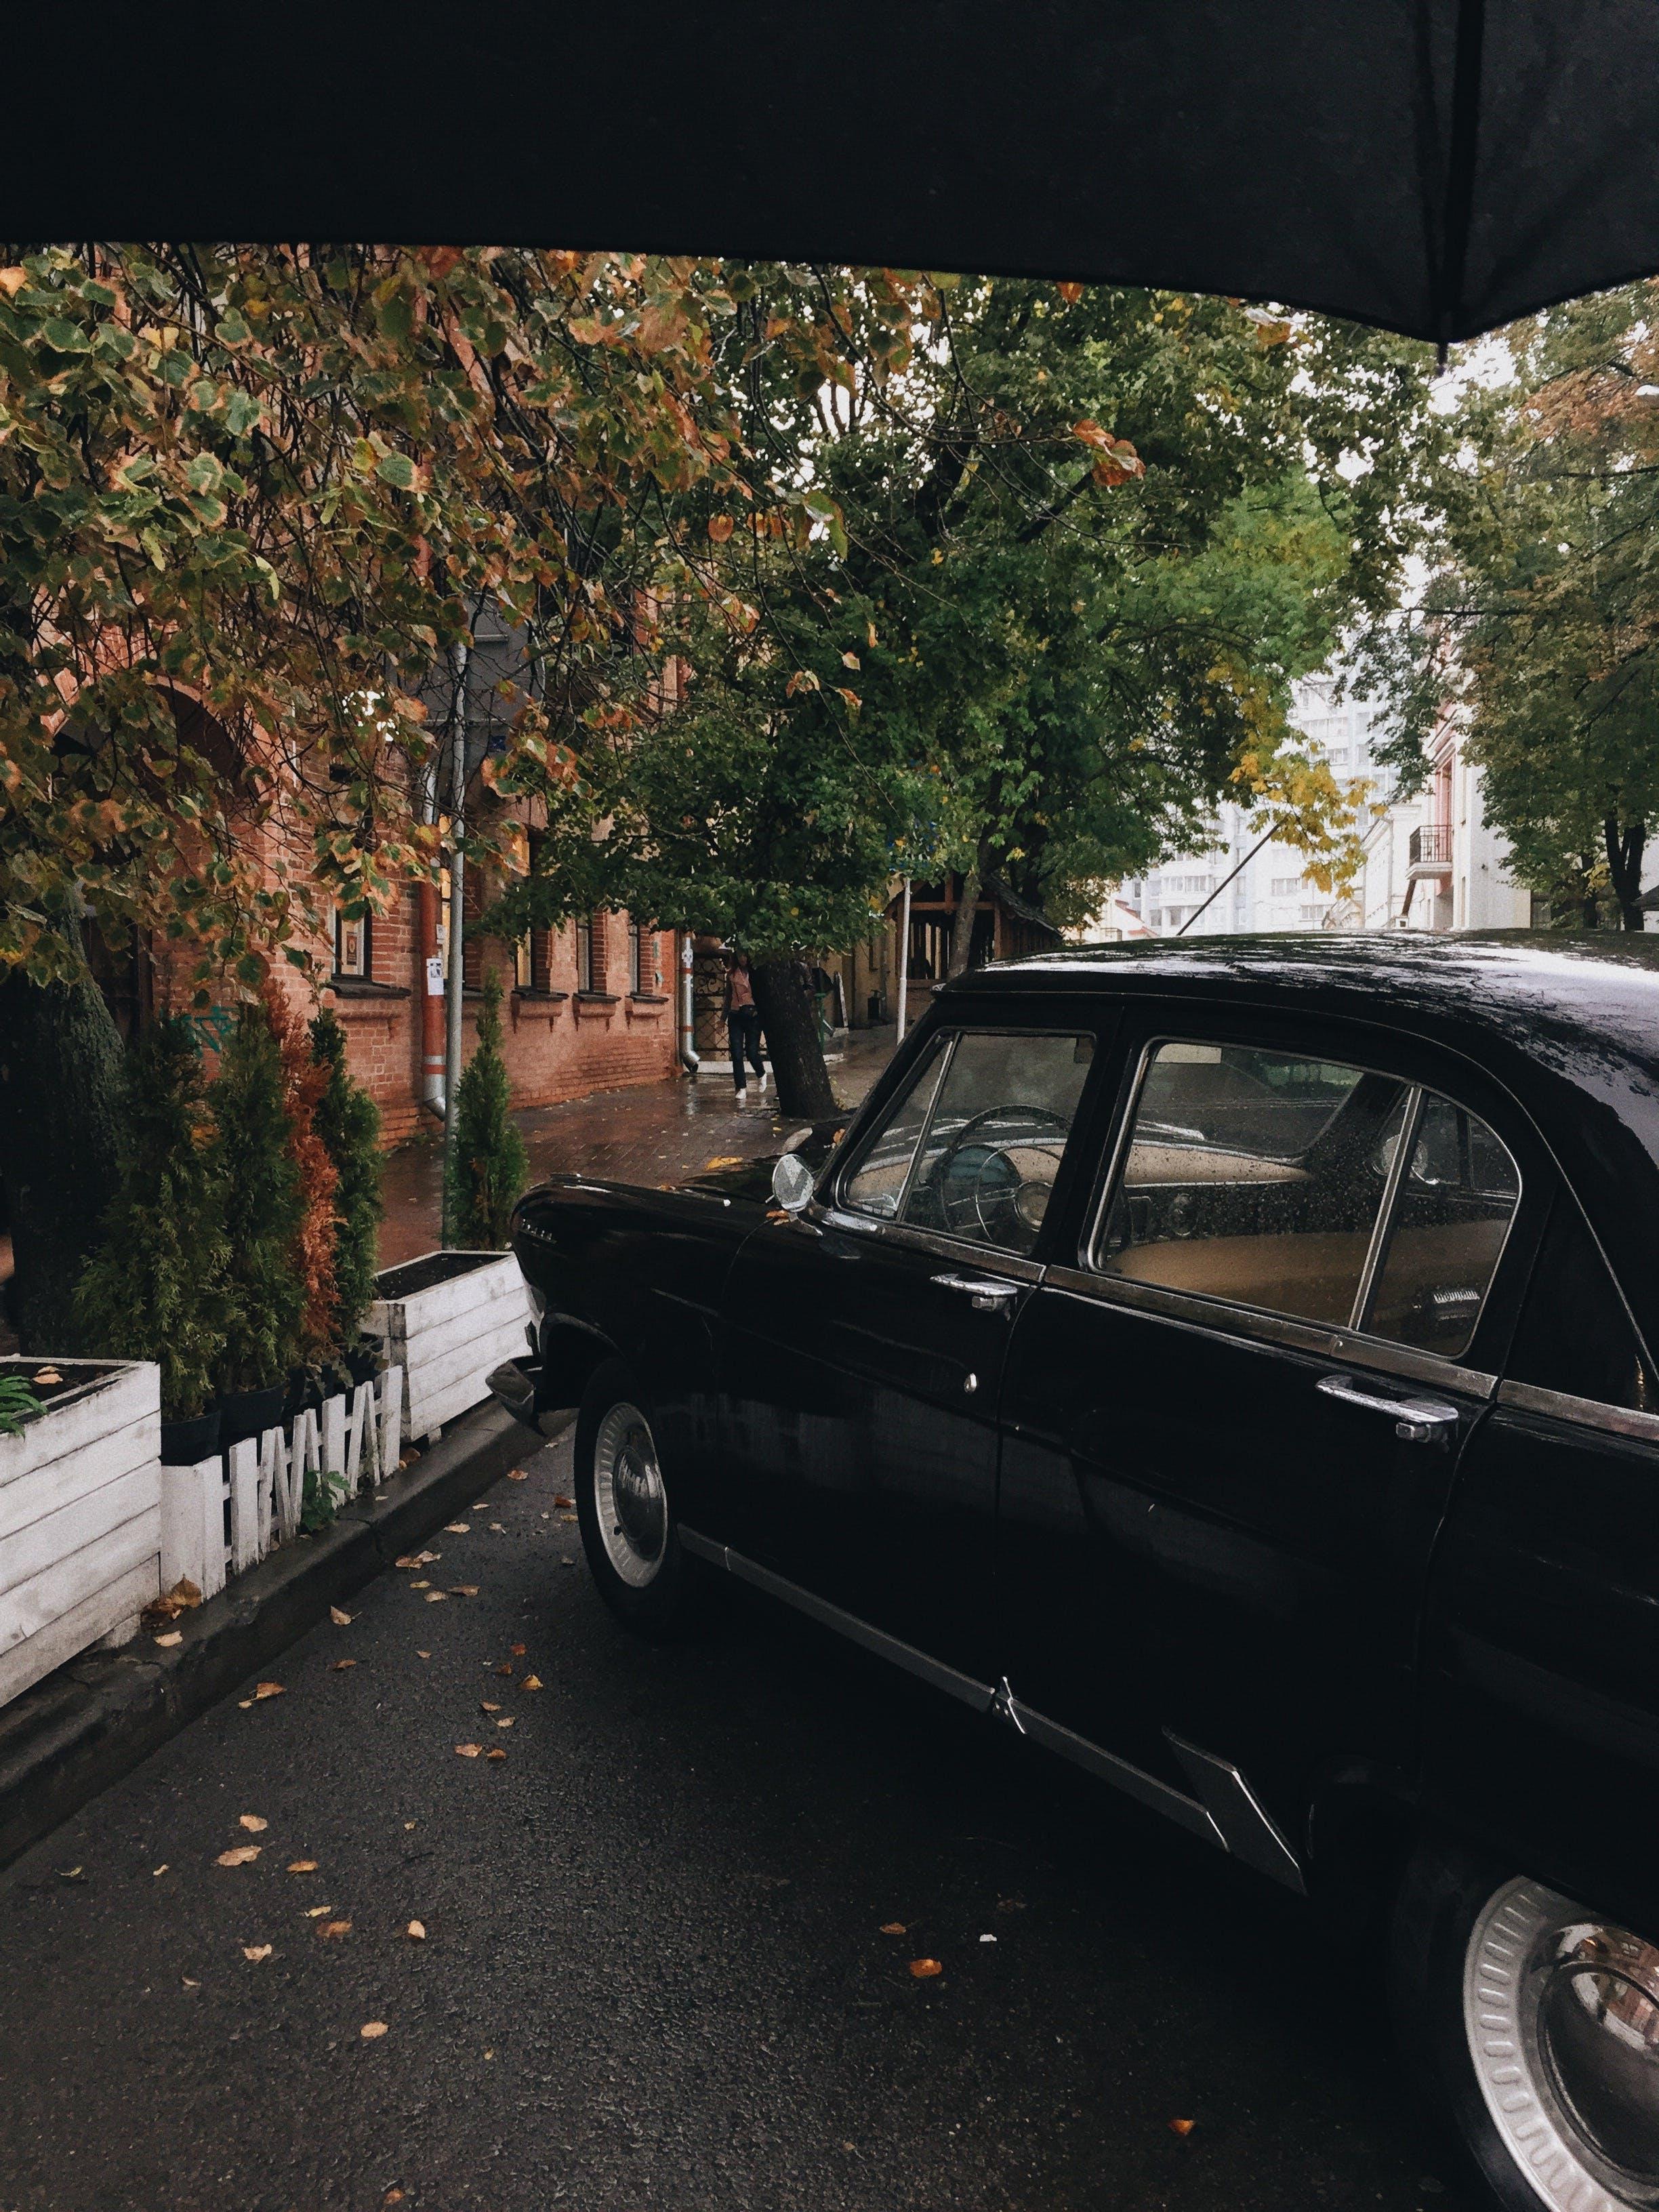 Black Sedan Parked Near Plants